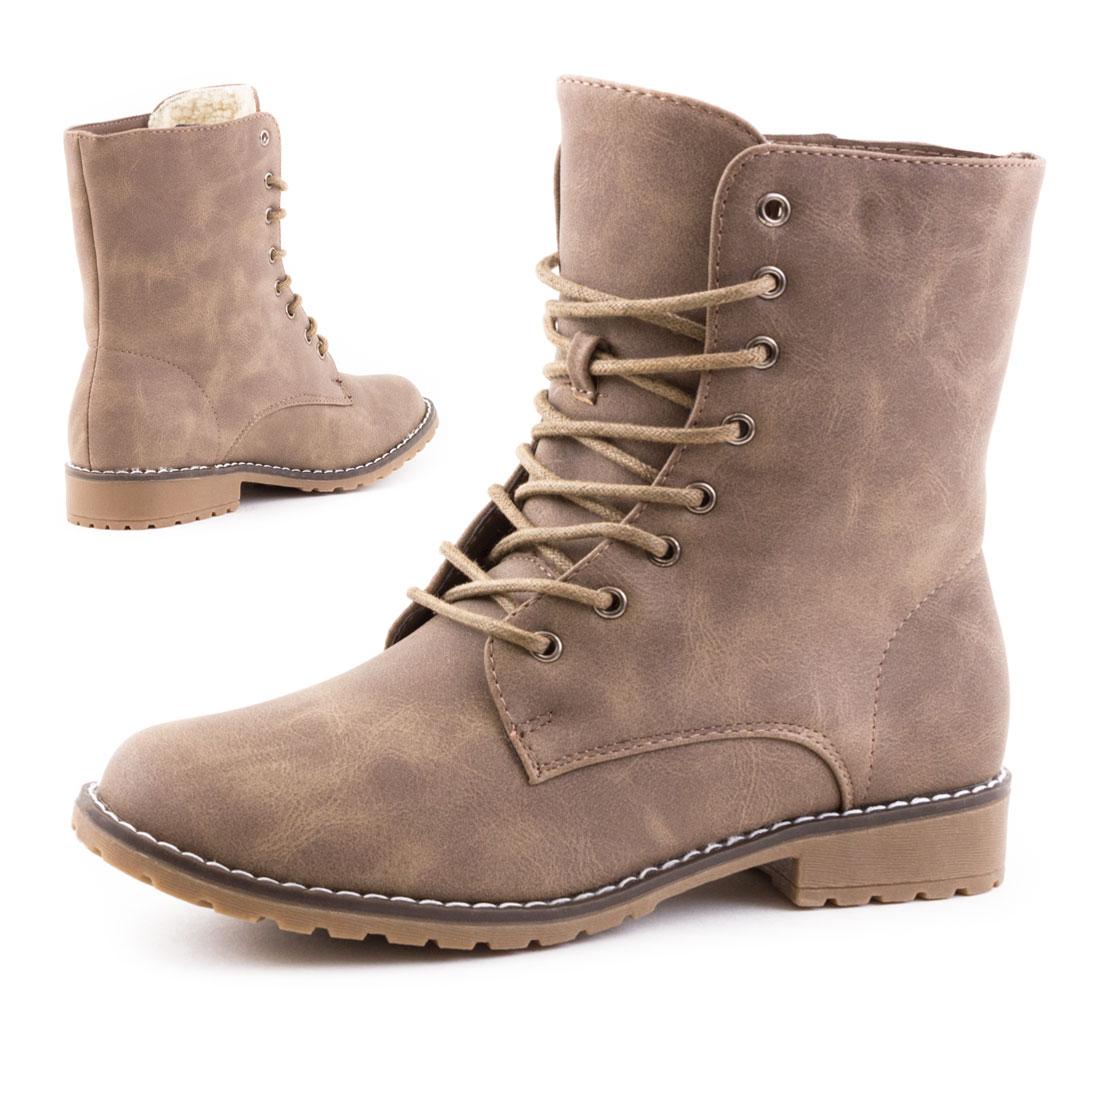 neu damen schn r stiefeletten stiefel boots schuhe gr e 36 37 38 39 40 41 ebay. Black Bedroom Furniture Sets. Home Design Ideas